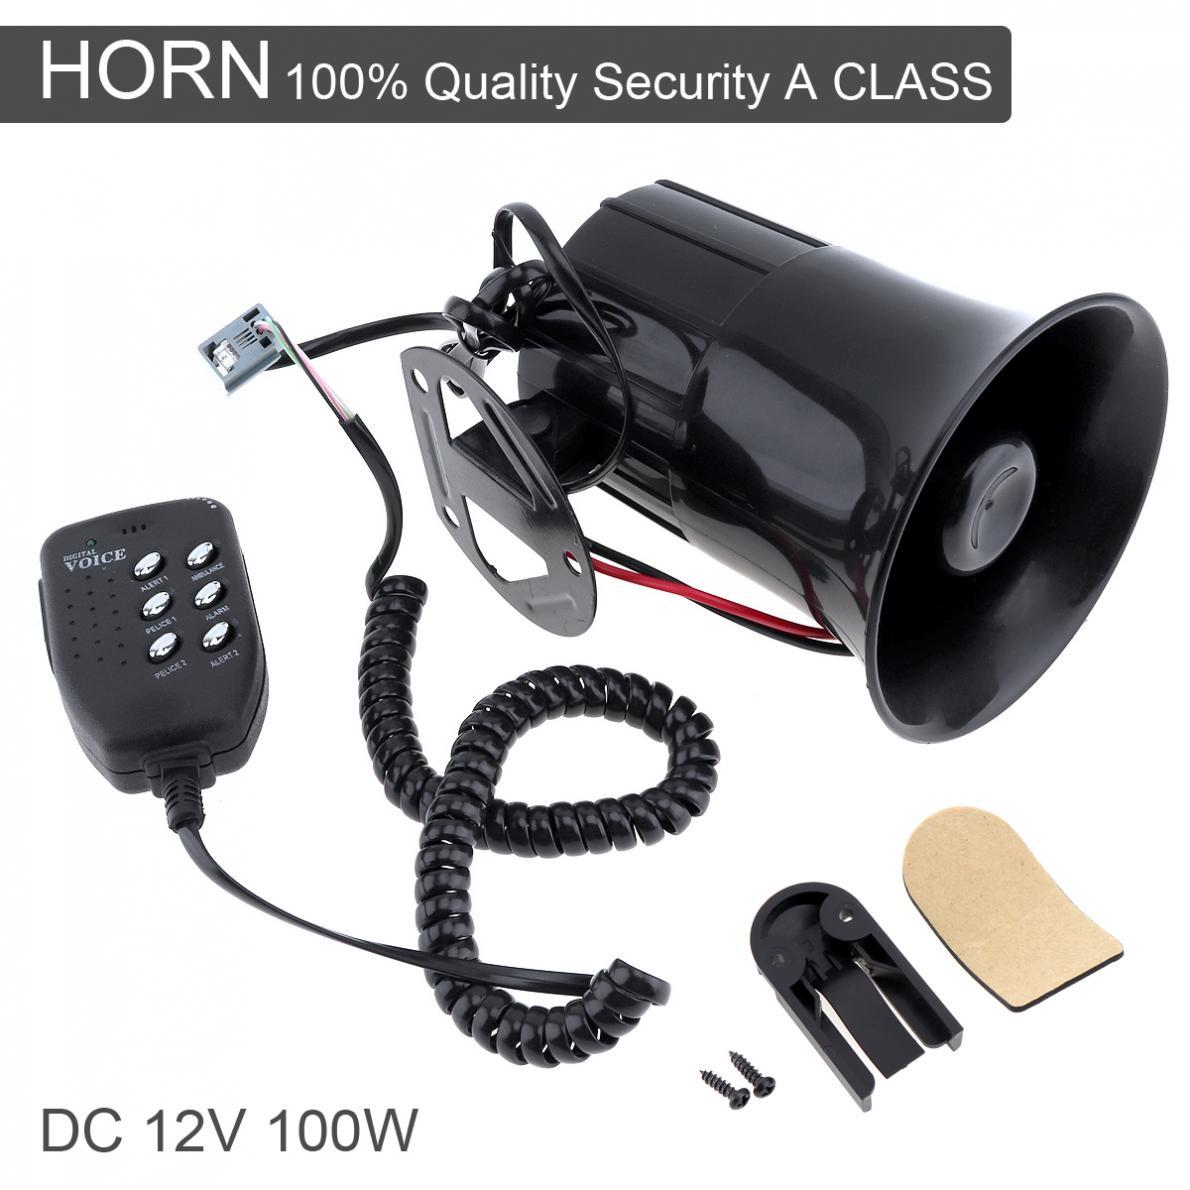 12 v Laut 6 Sounds 120DB Air Horn Sirene Lautsprecher für Auto Auto Boot Megaphon mit MIC Lautsprecher Sirene